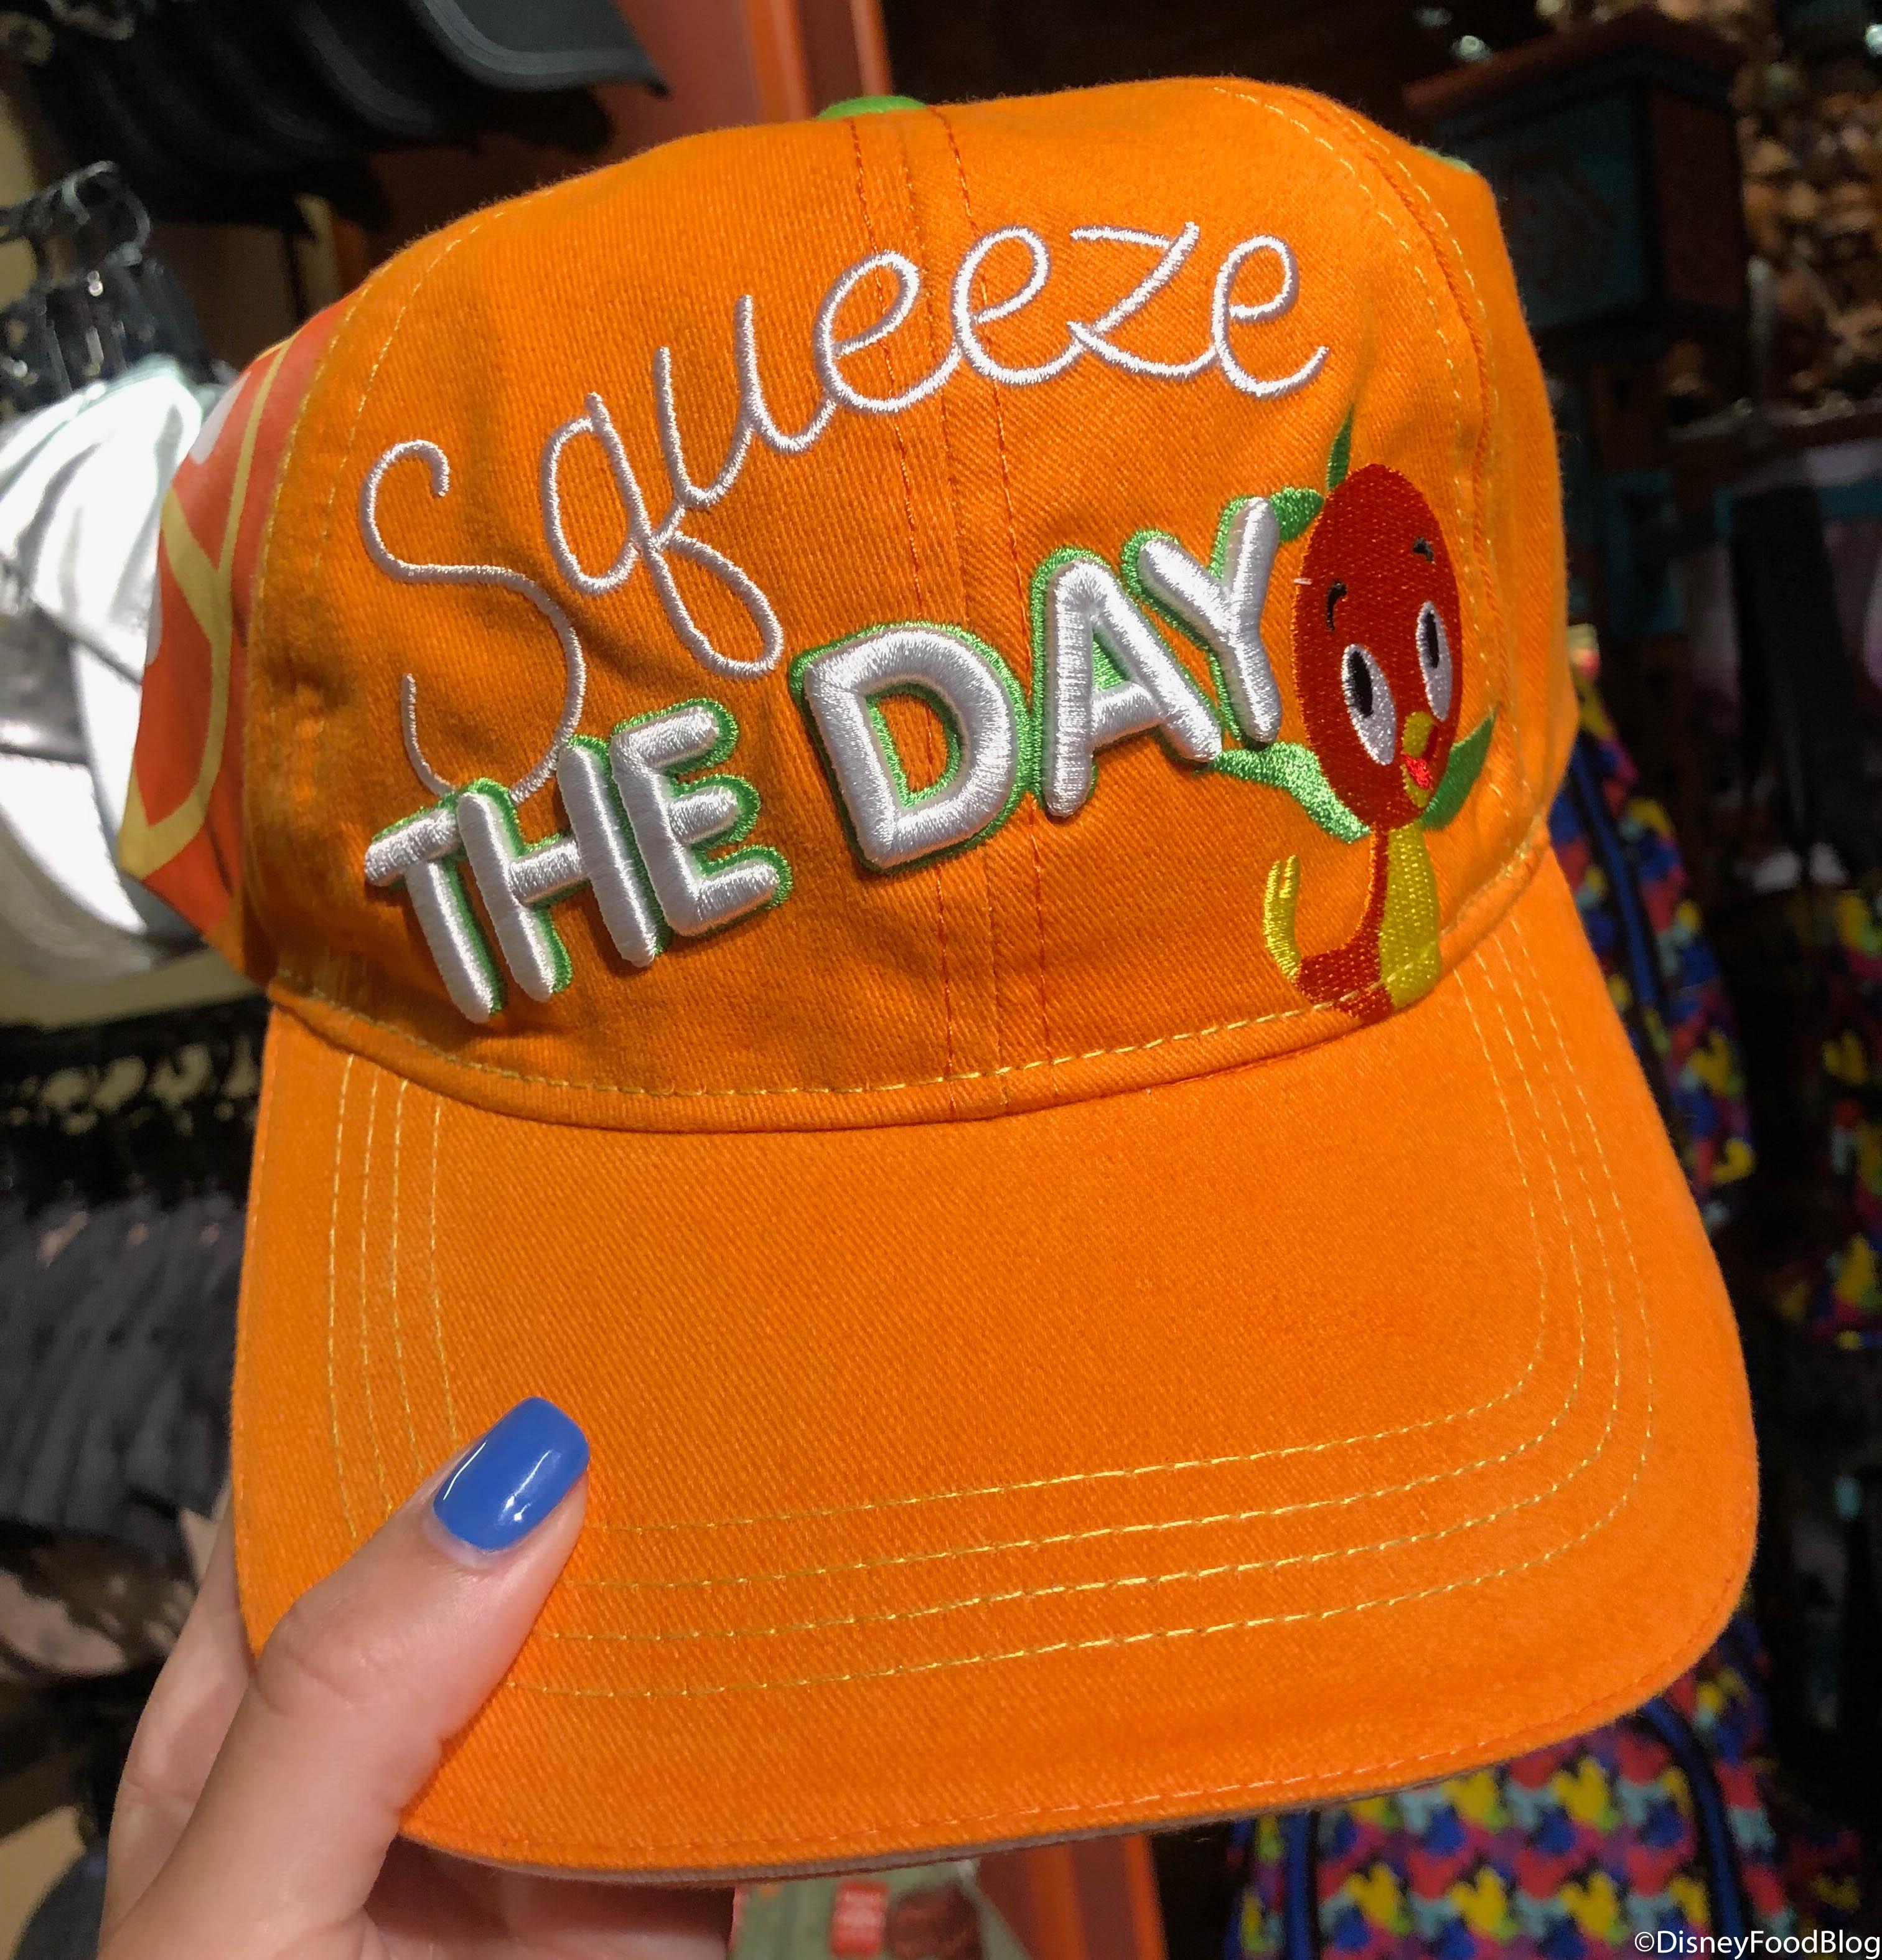 d1c87c12c81c3b Squeeze the Day